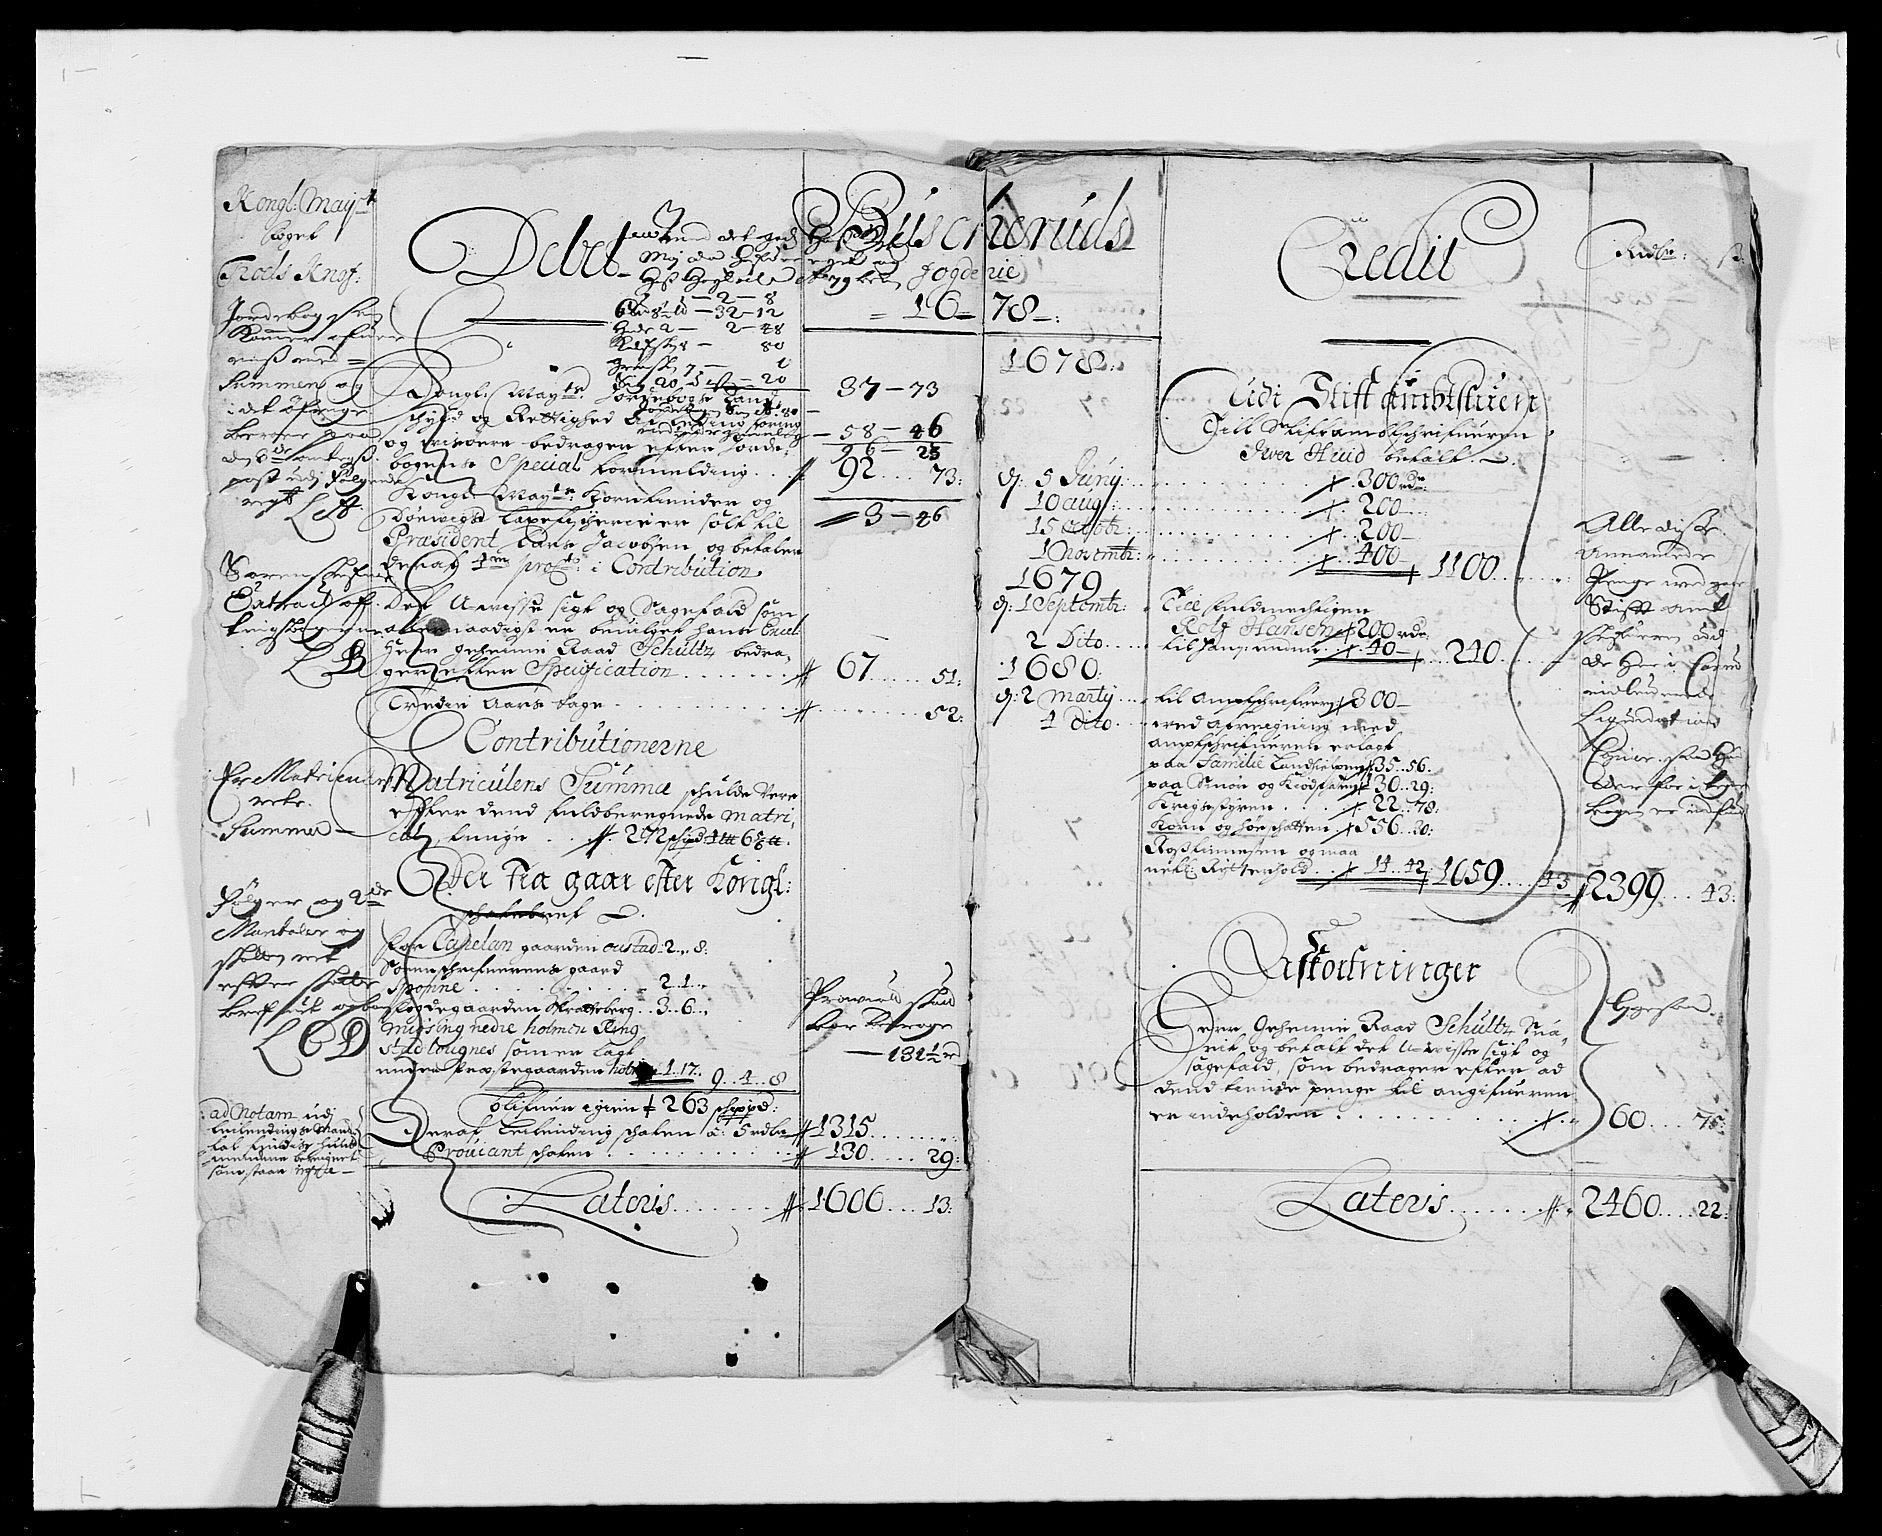 RA, Rentekammeret inntil 1814, Reviderte regnskaper, Fogderegnskap, R25/L1674: Fogderegnskap Buskerud, 1678-1681, s. 3